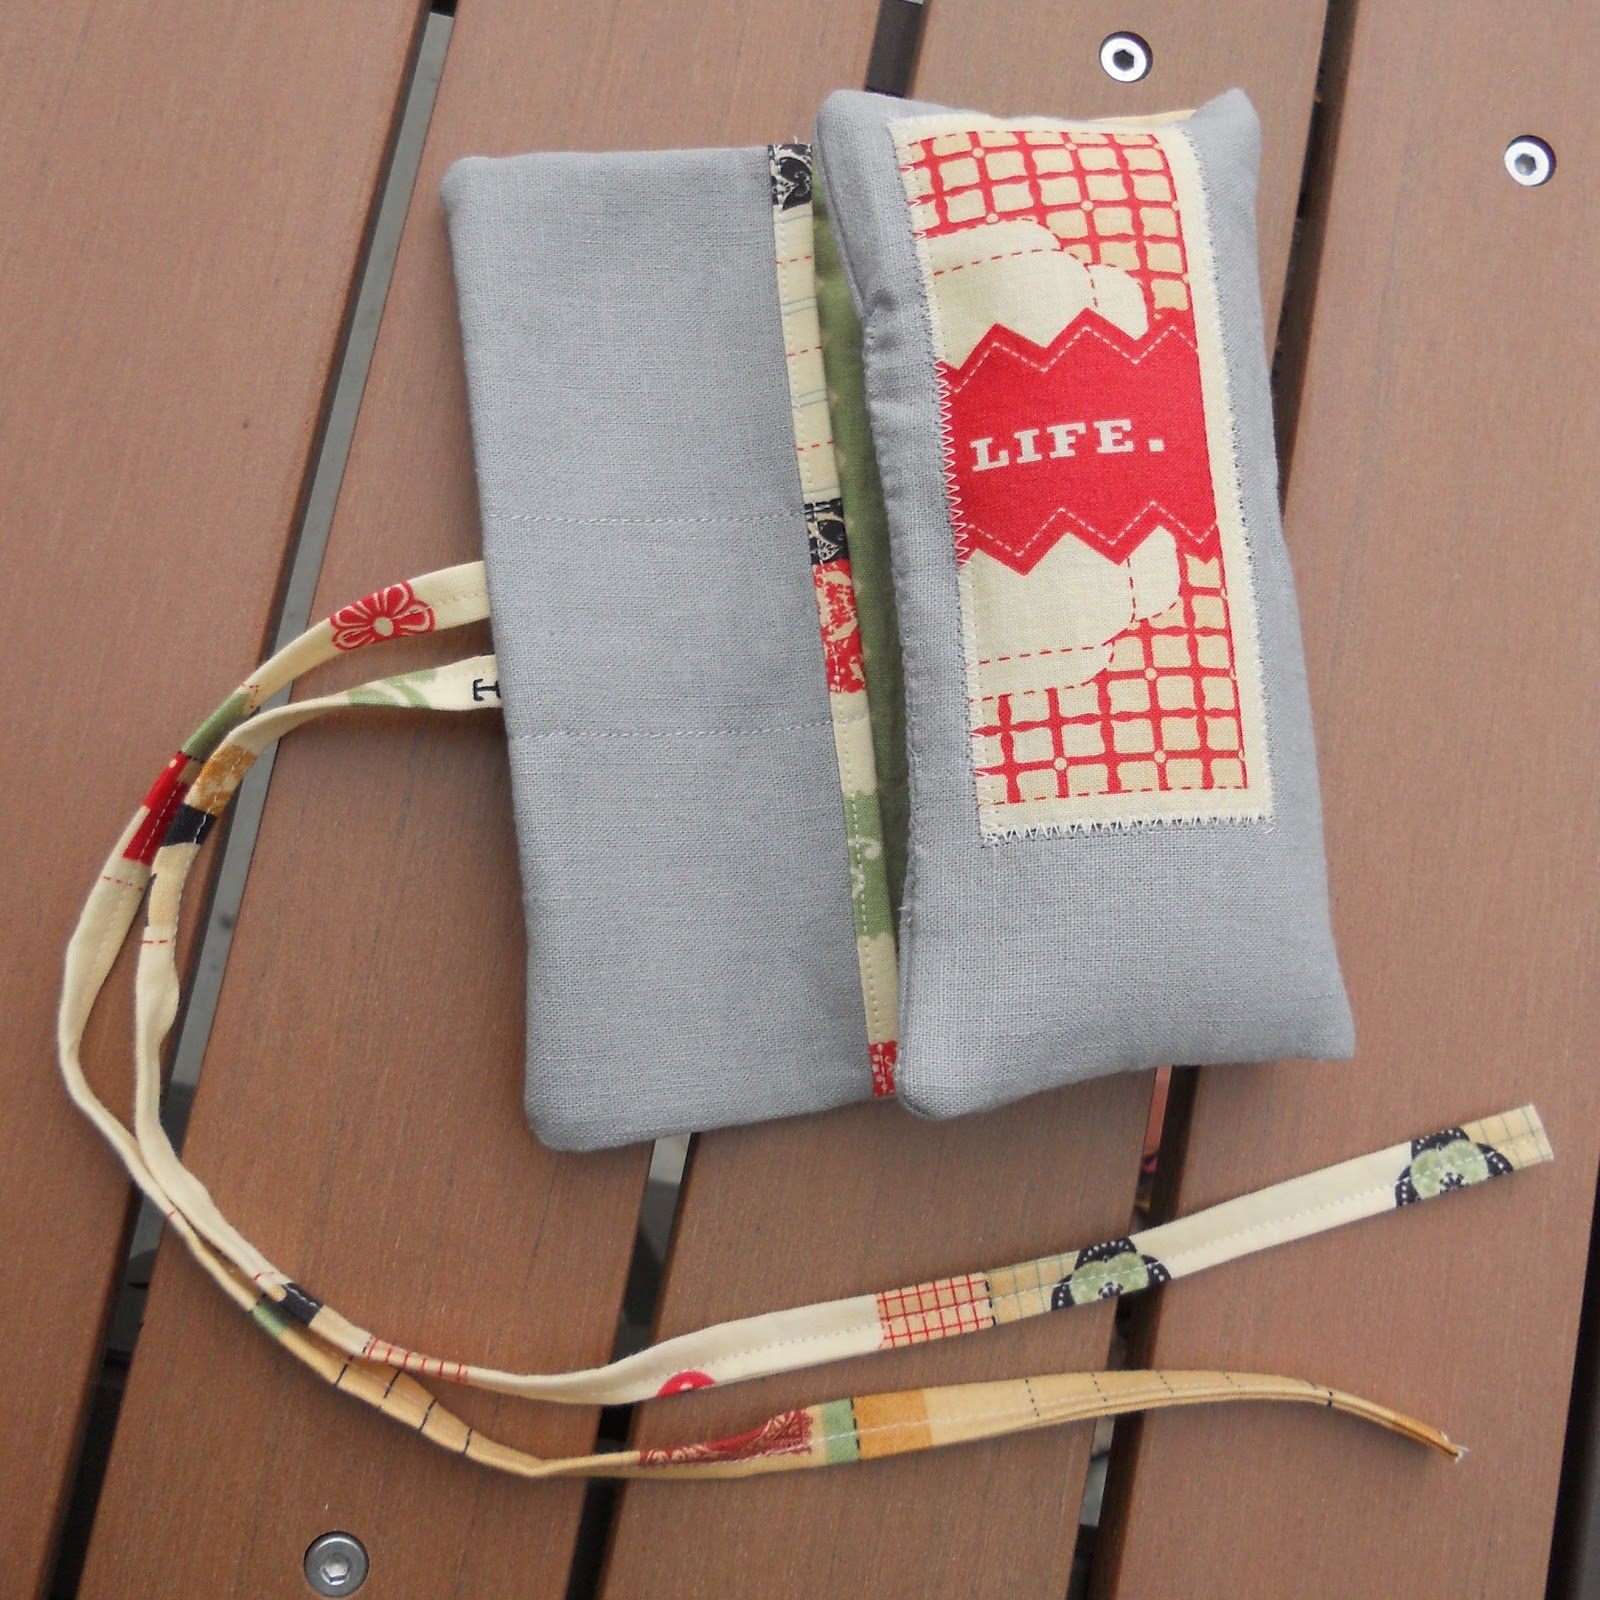 Book Cover Sewing Kit : Fabric mutt zakka sewing kit